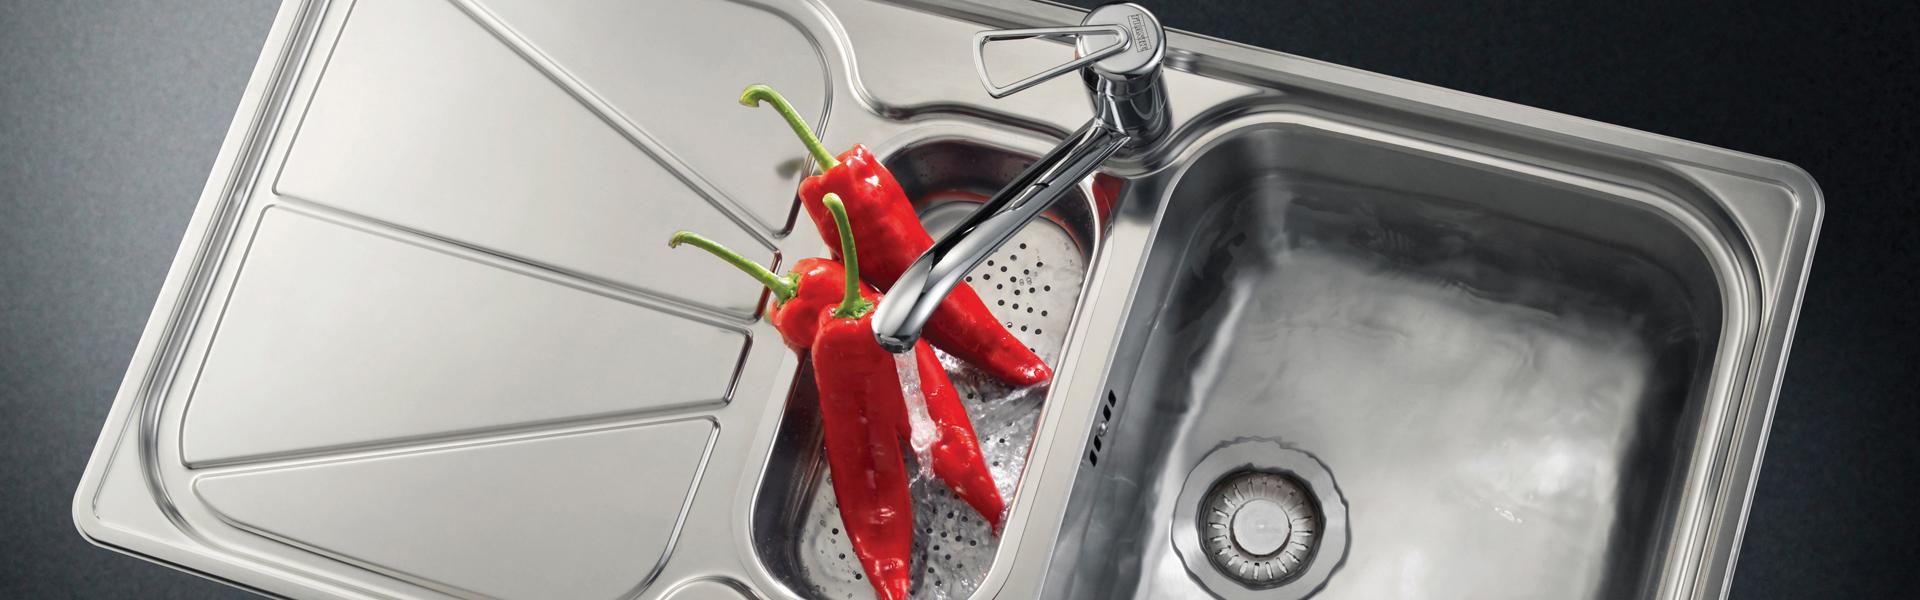 Gallery appliances sinks taps